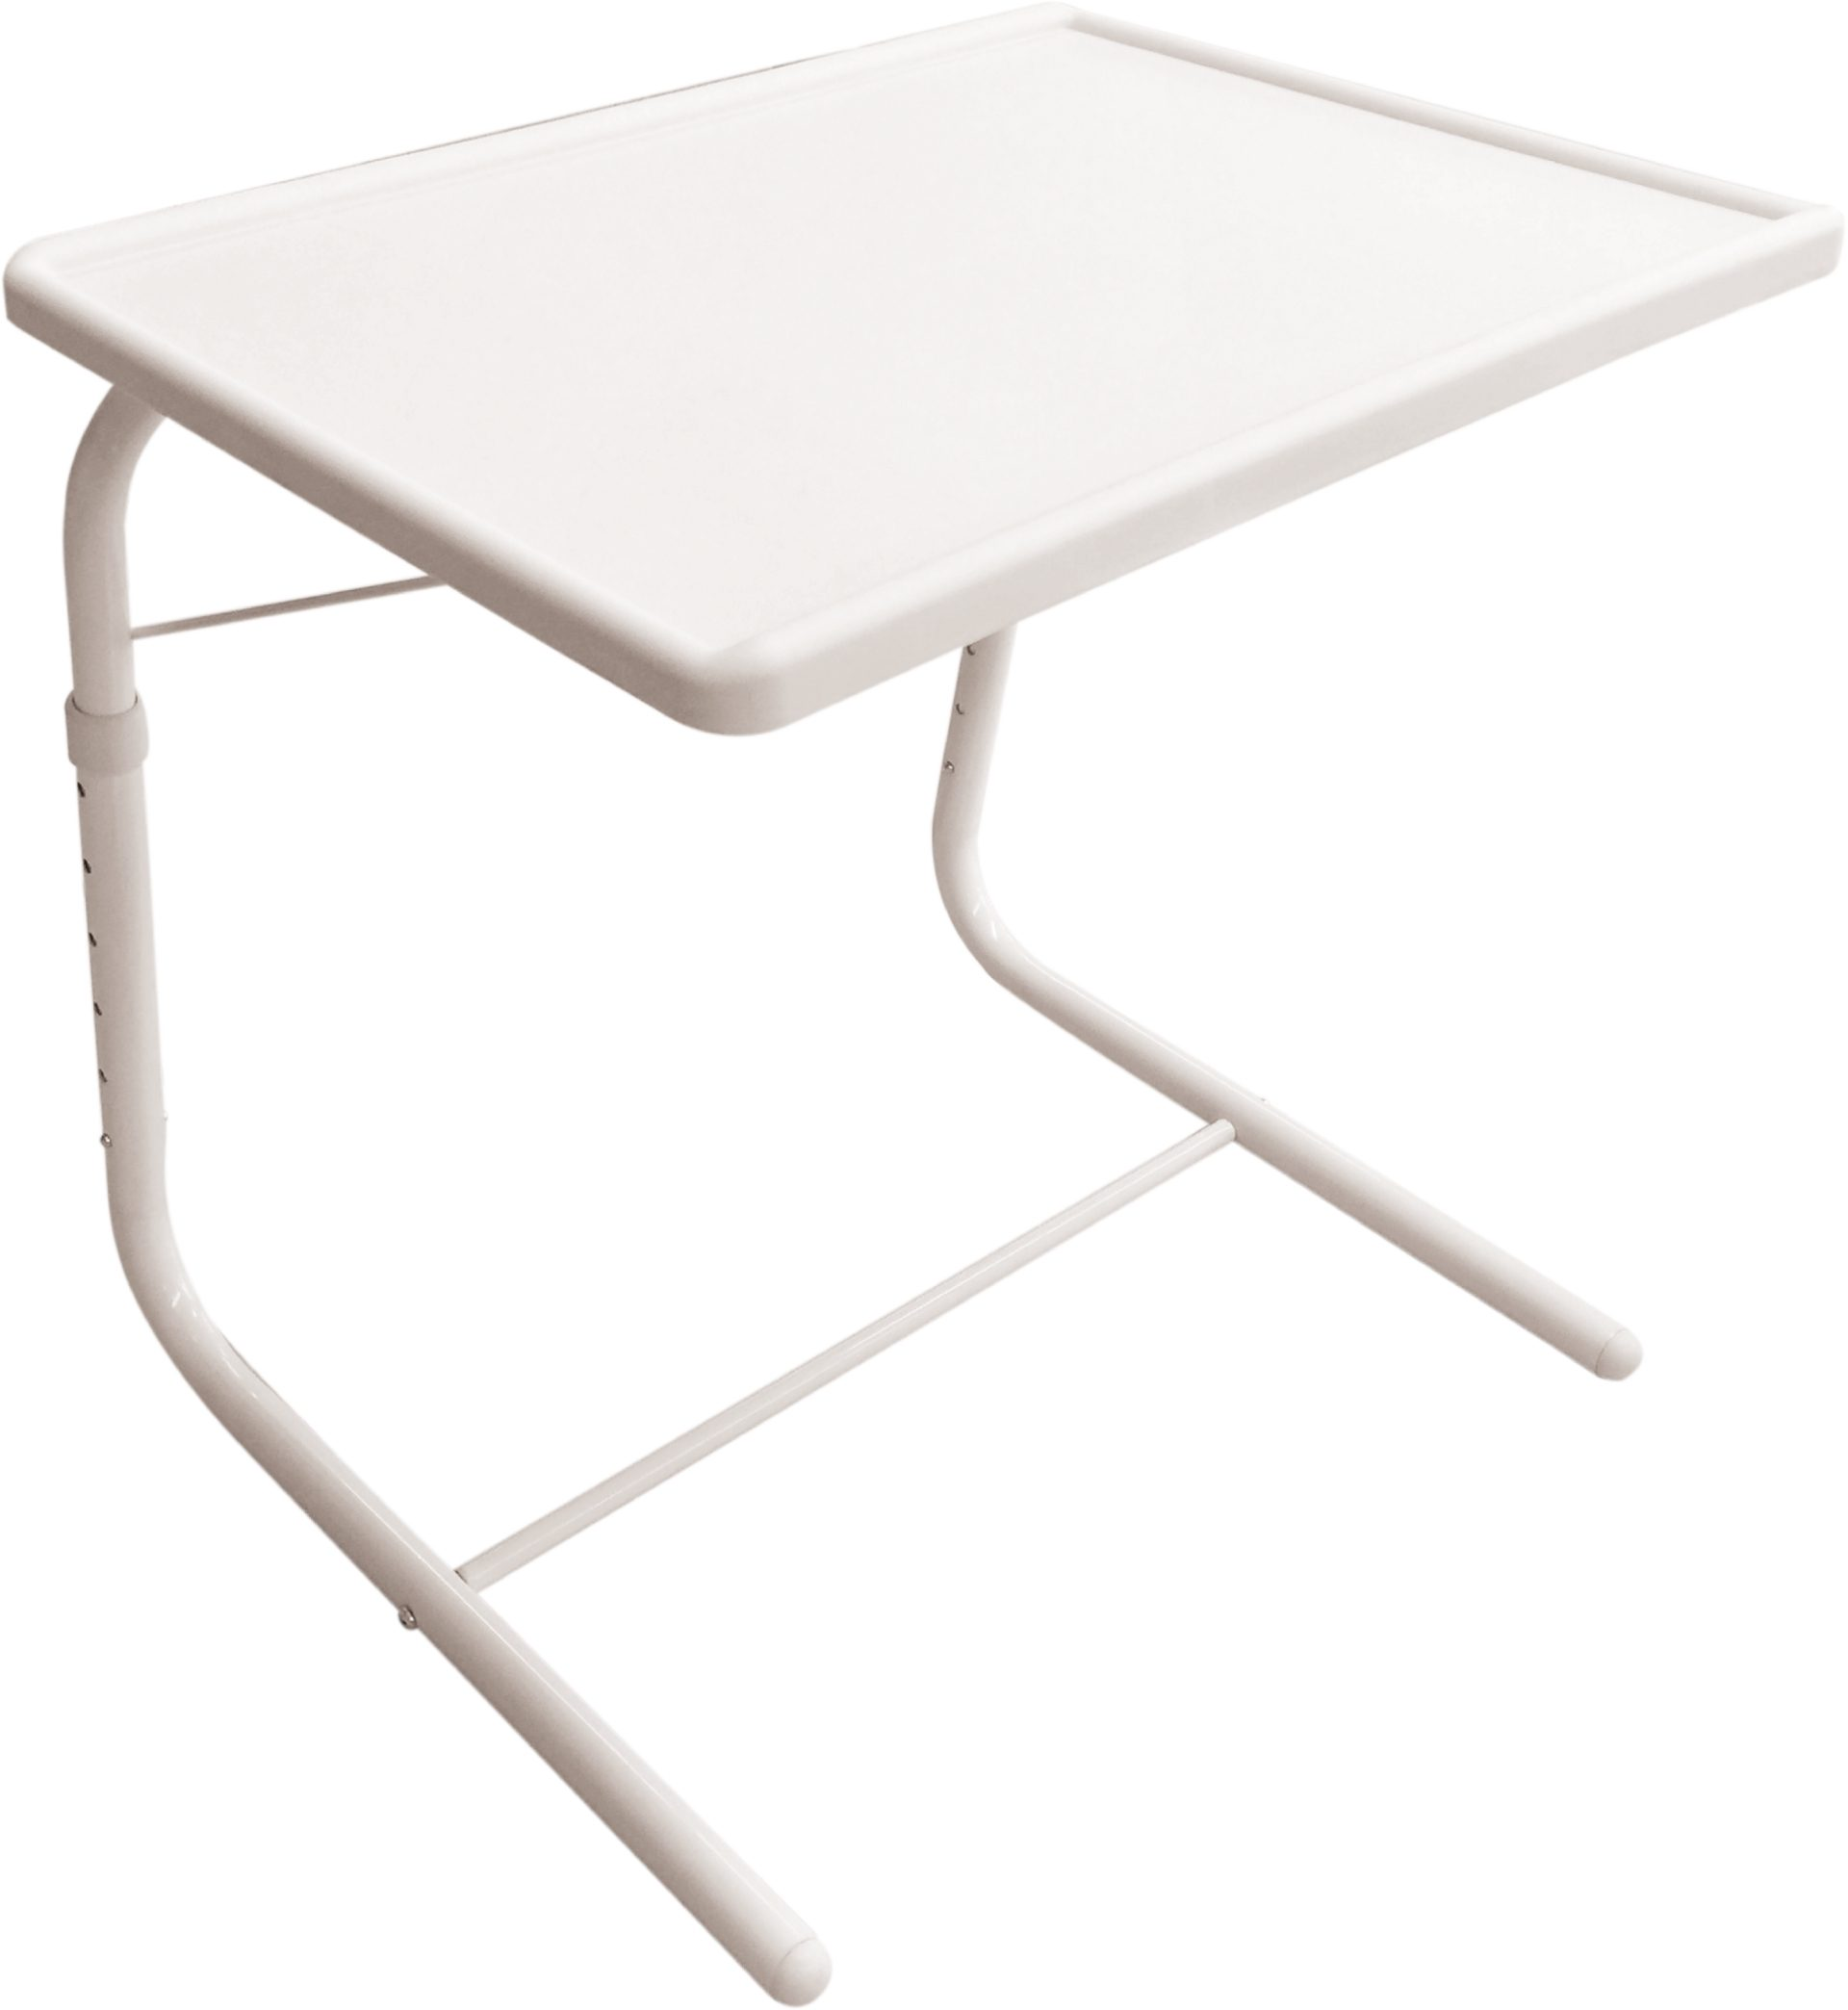 Table ajustable